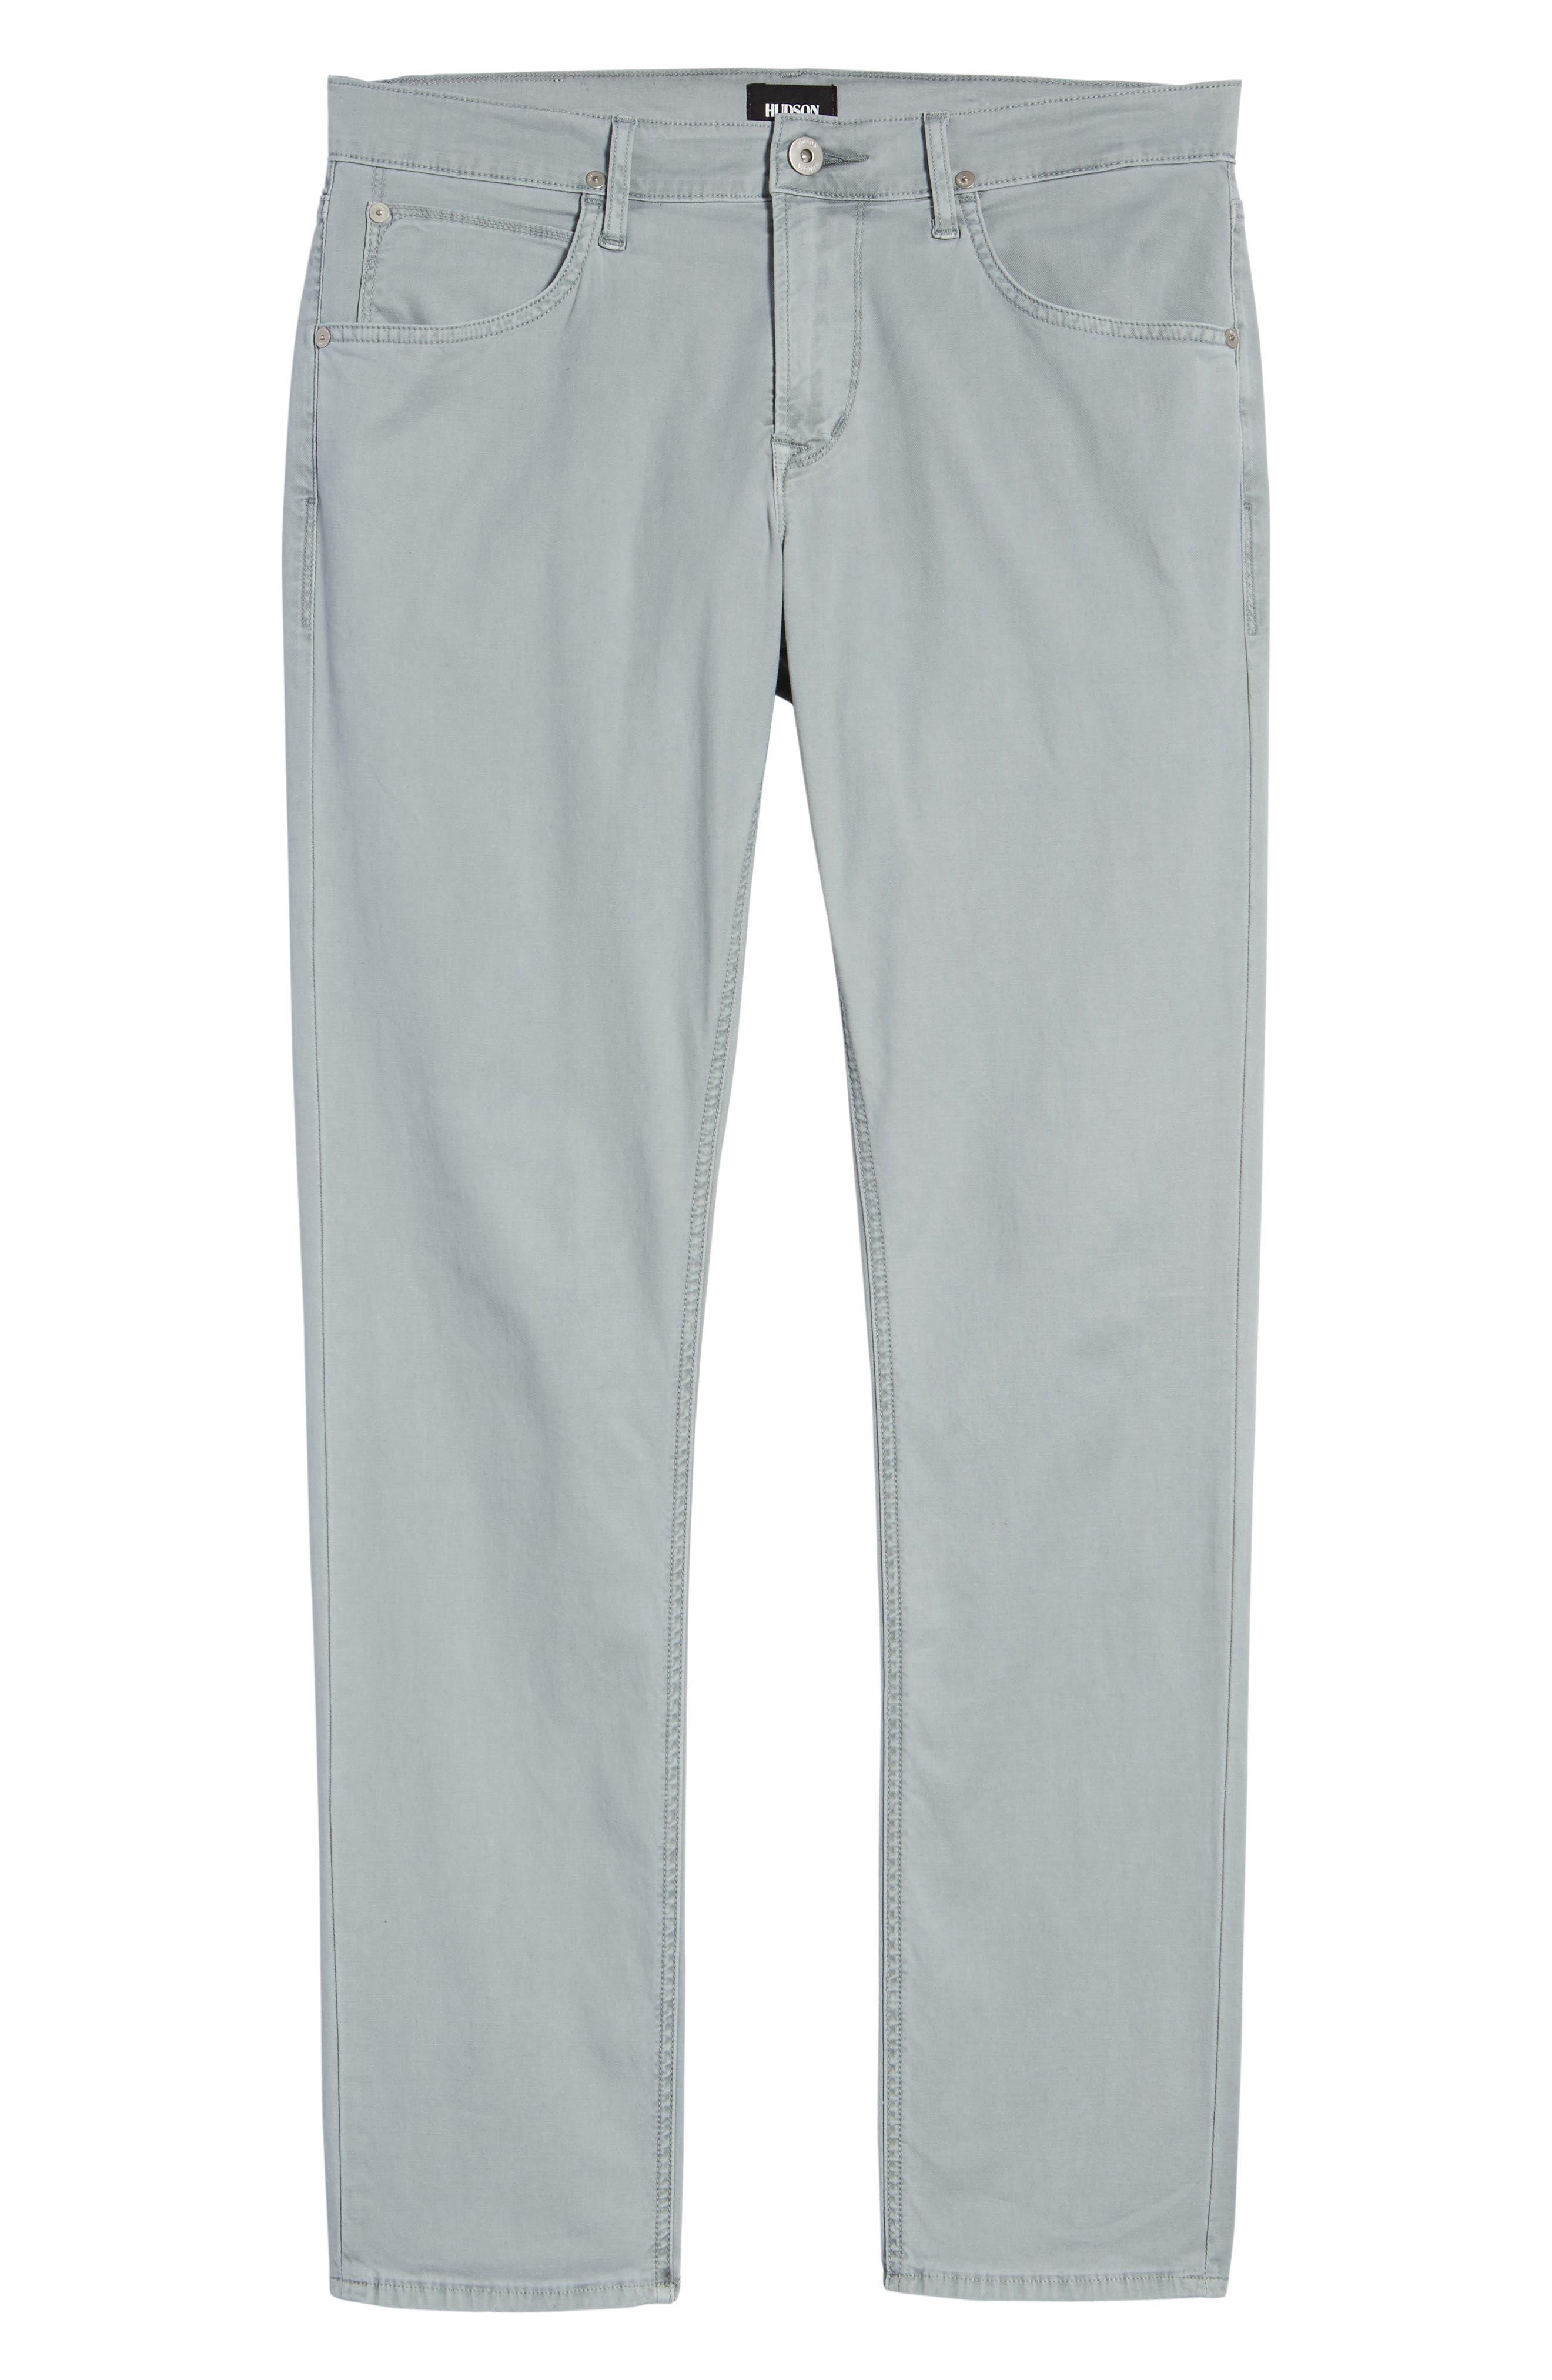 Blake Slim Fit Jeans,                             Alternate thumbnail 6, color,                             Steel Blue